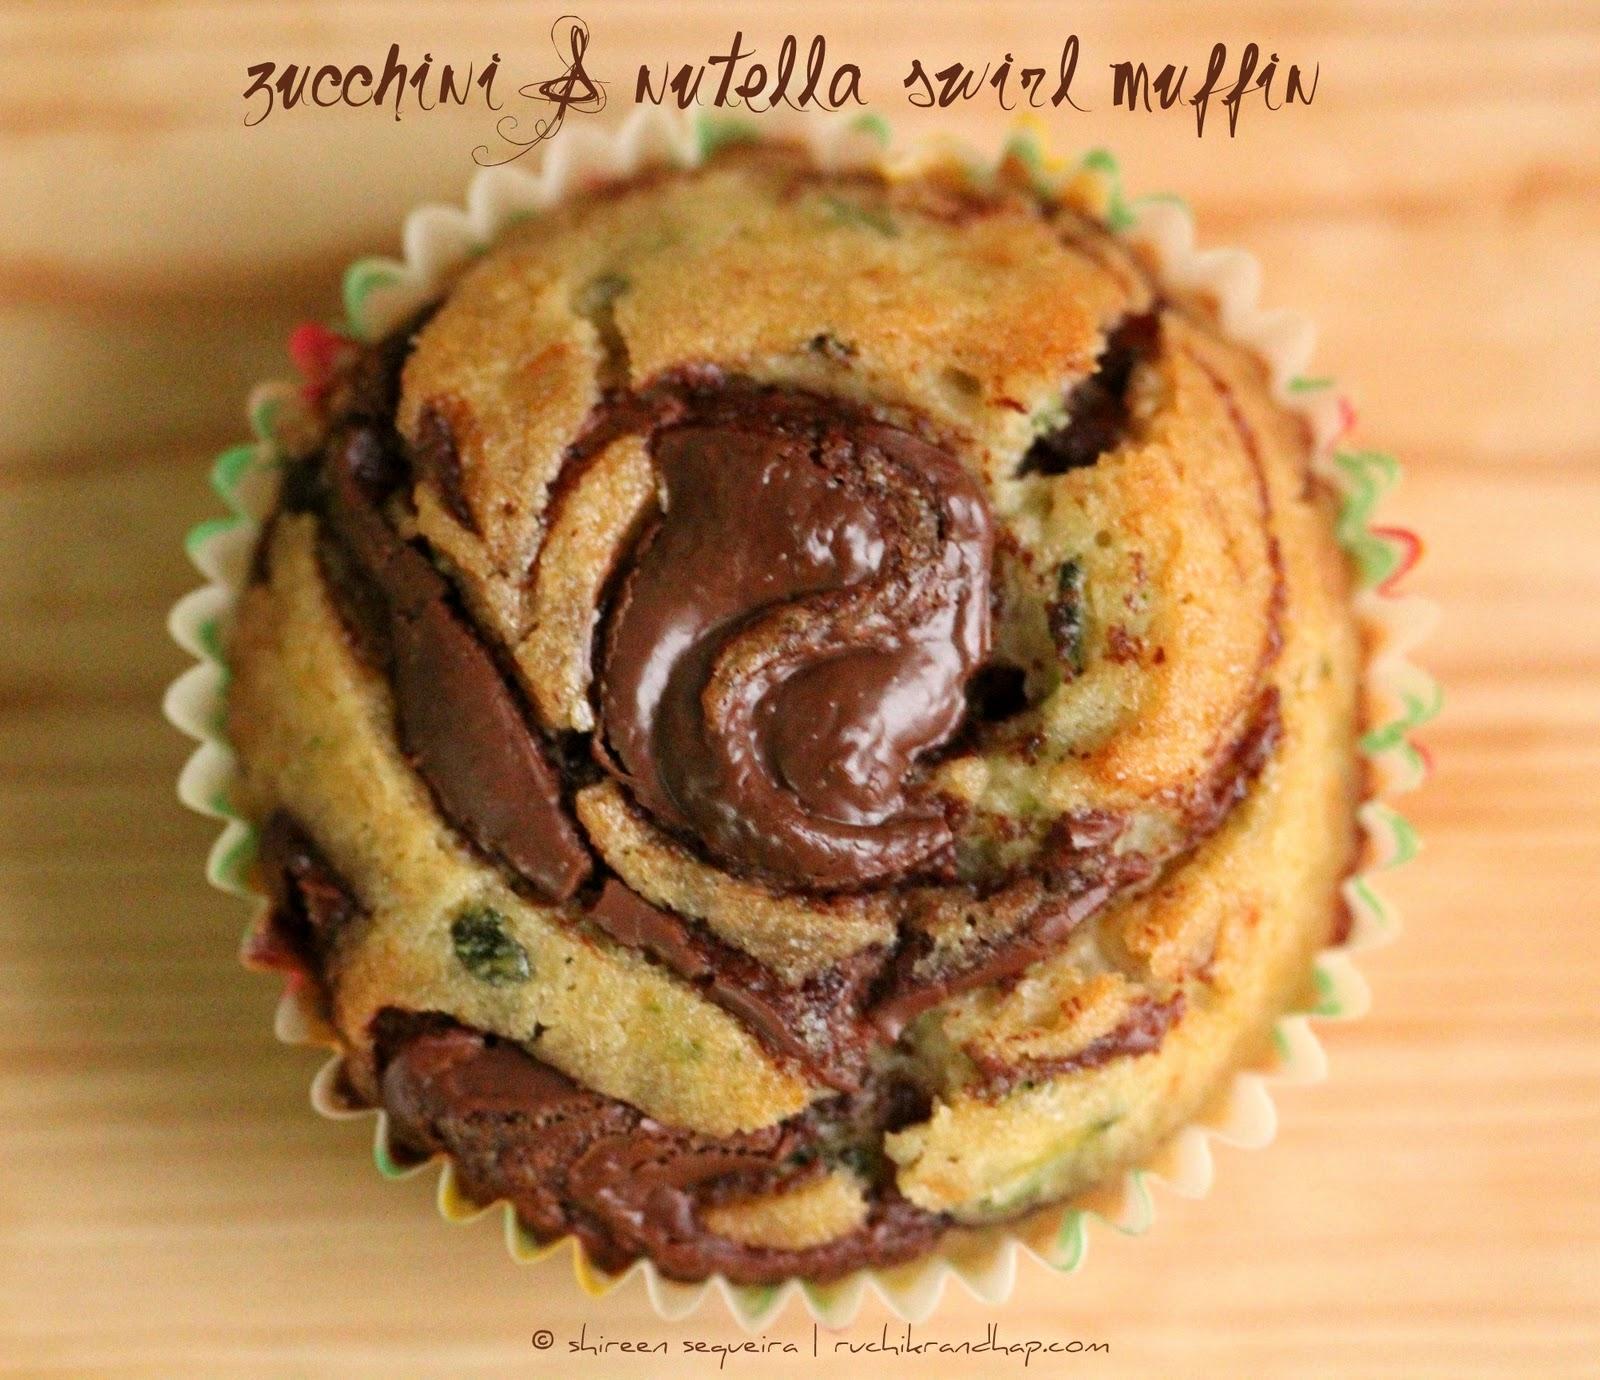 Zucchini+%26+Nutella+Swirl+Muffins+%2811%29+-+1.jpg